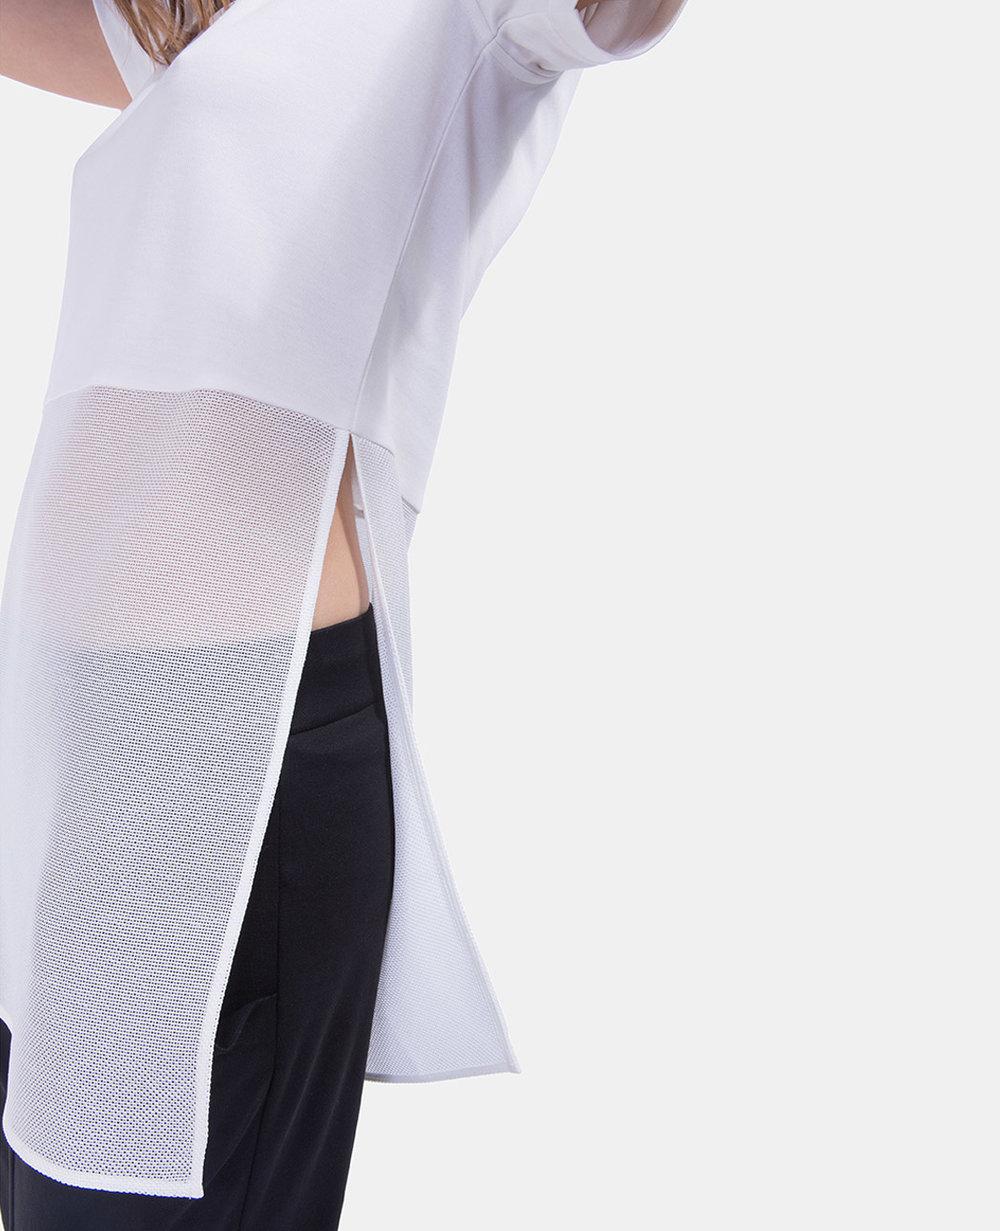 kalila-ekt0119-white-detail-sideslit-tshirt-shortsleeve-mesh.jpg